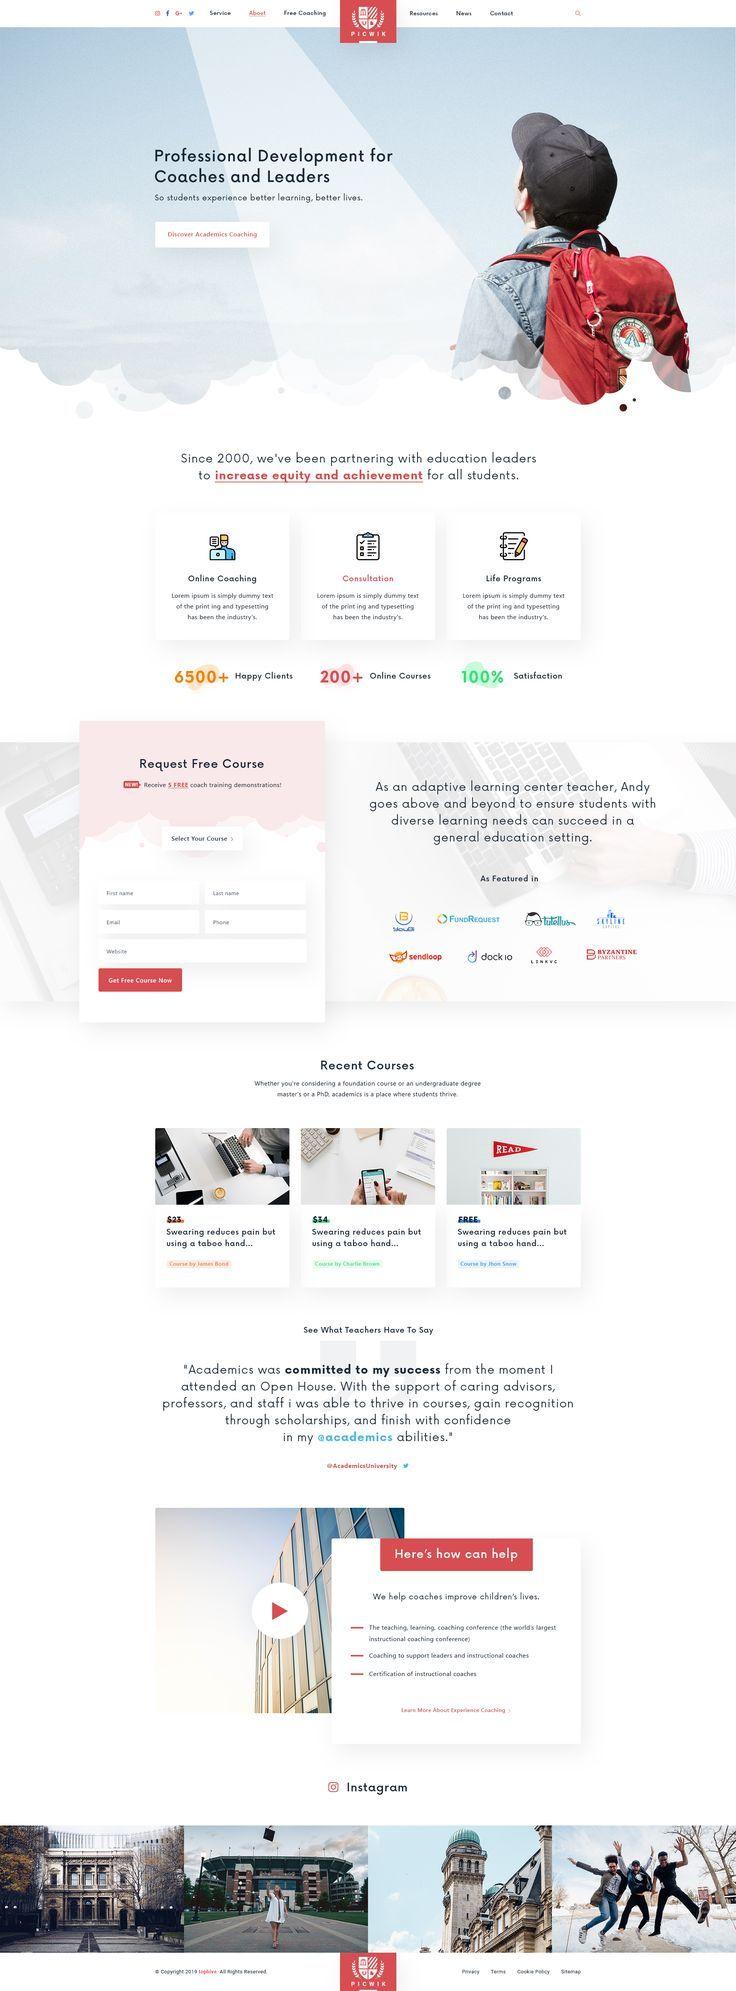 Picwik University Education Landing Page In 2020 University Website Identity Design Logo Online Web Design